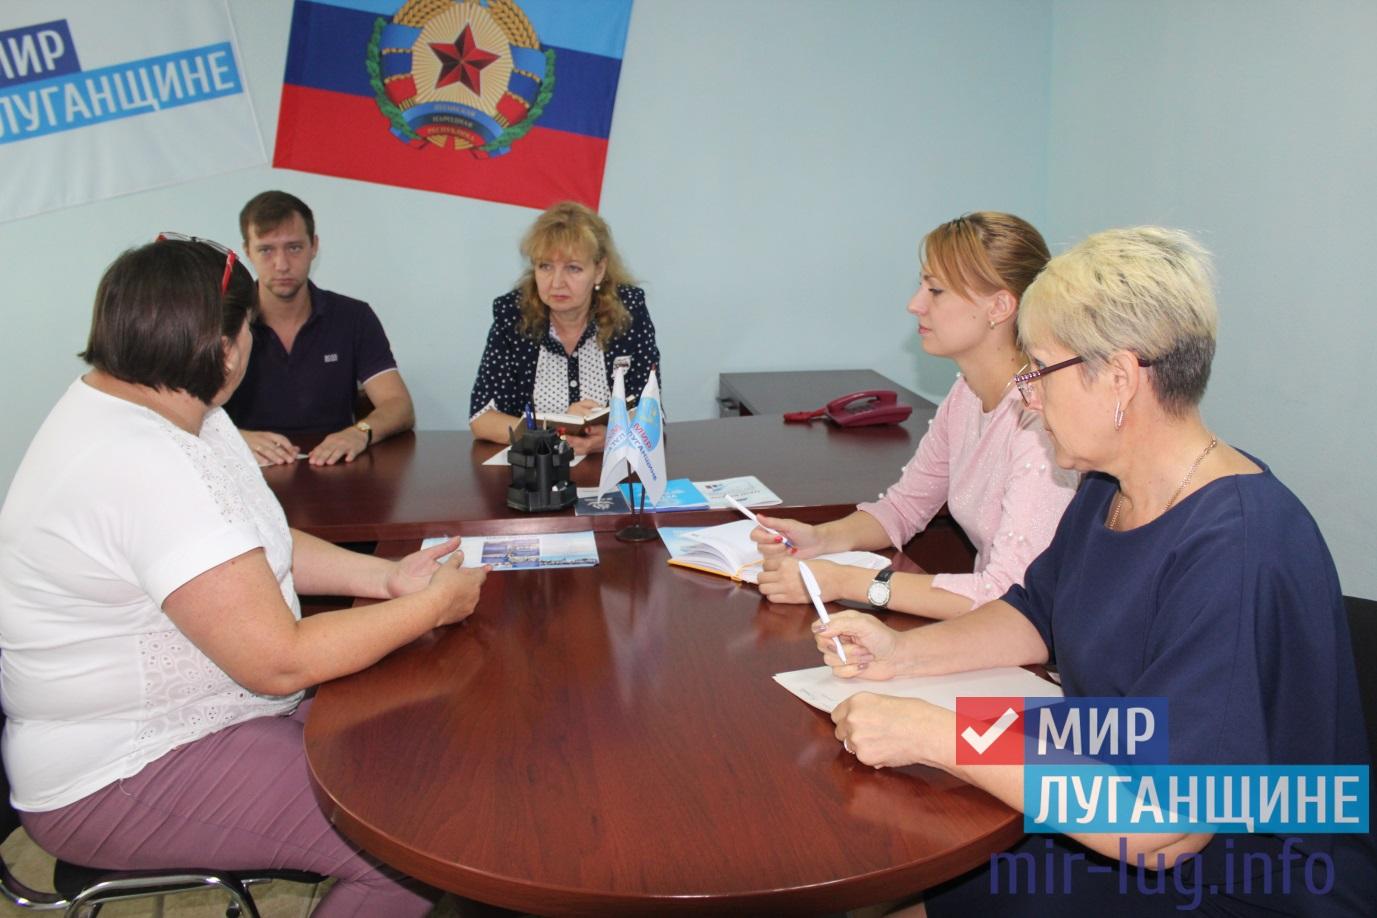 Депутат Народного Совета ЛНР провела прием в Славяносербске 1